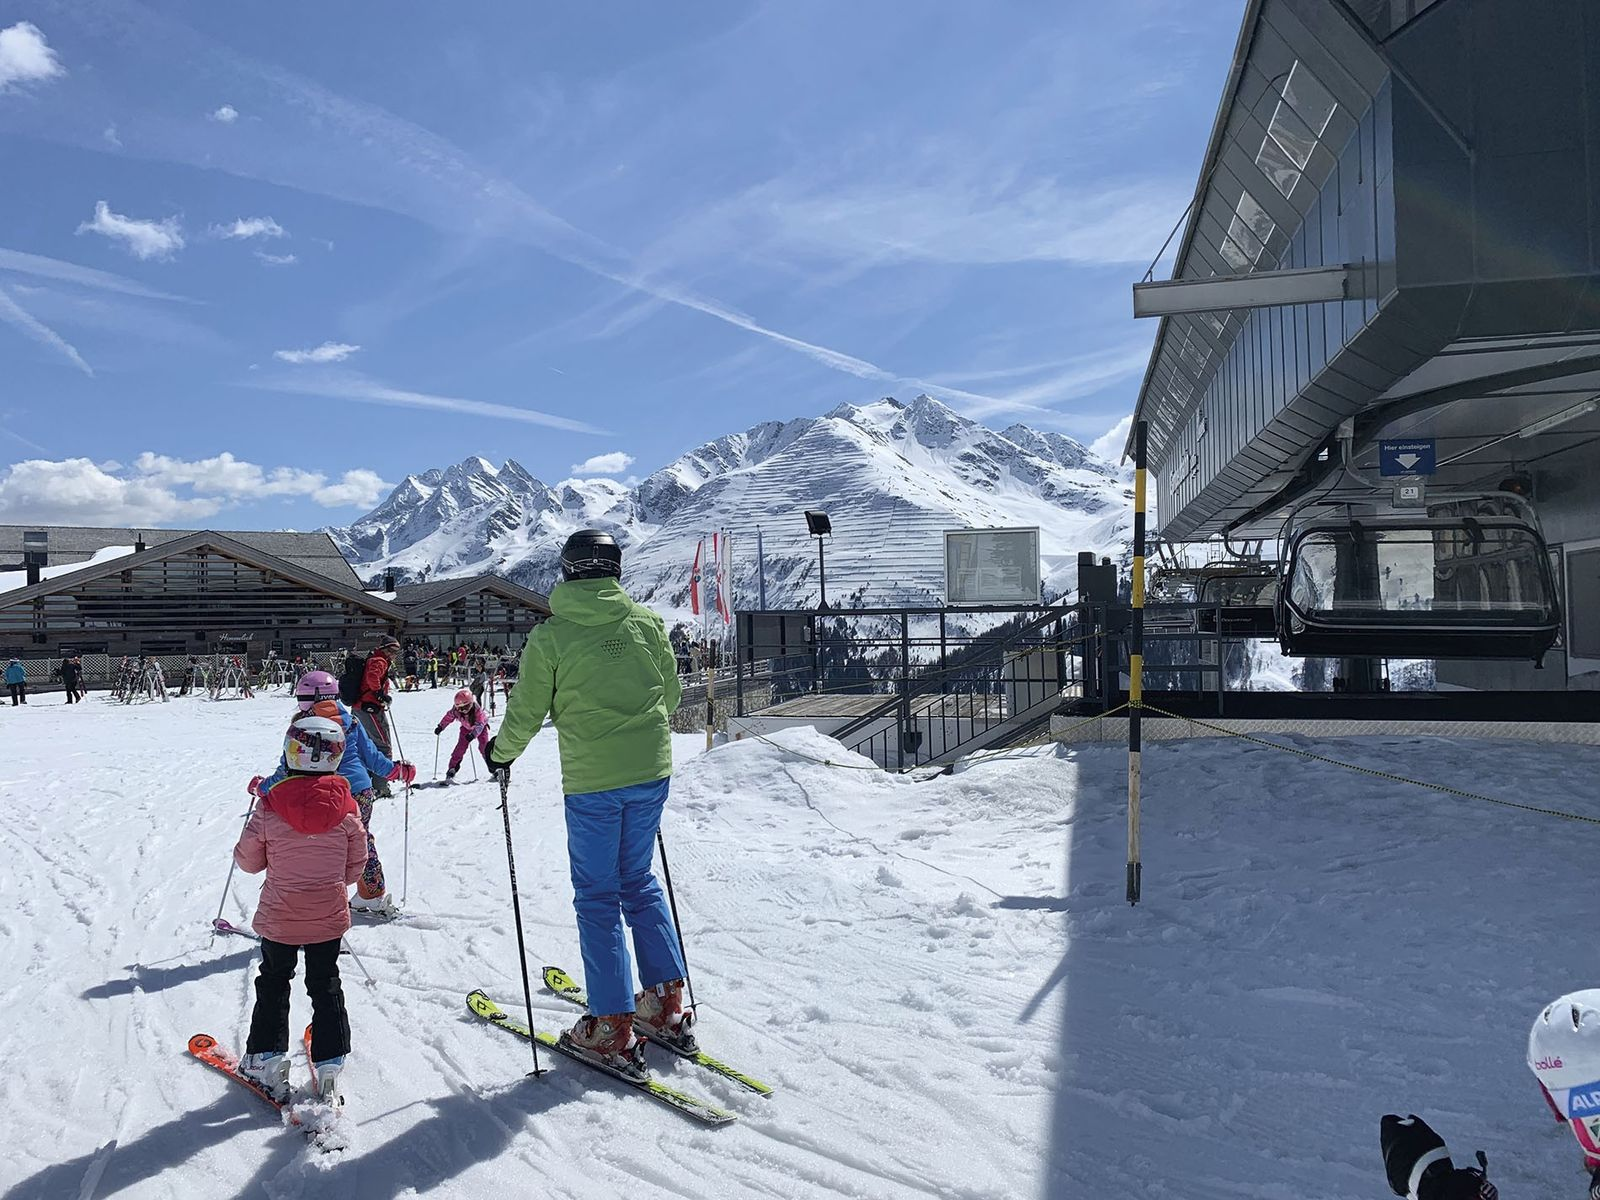 Schussing into ski school.